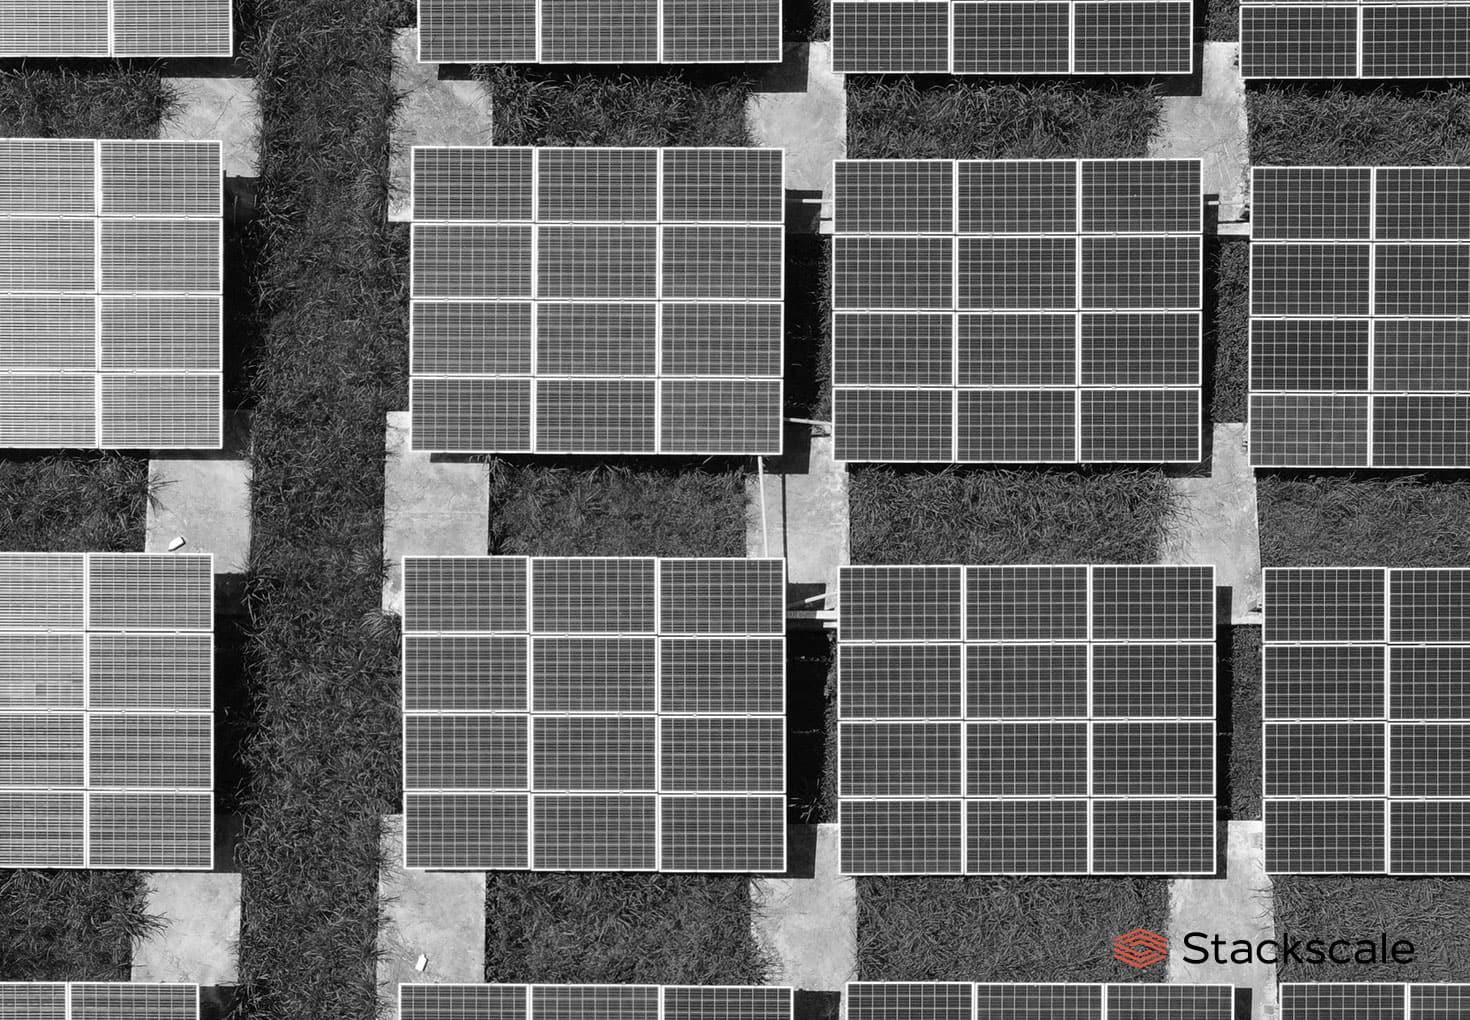 Energy efficiency measures in data centers